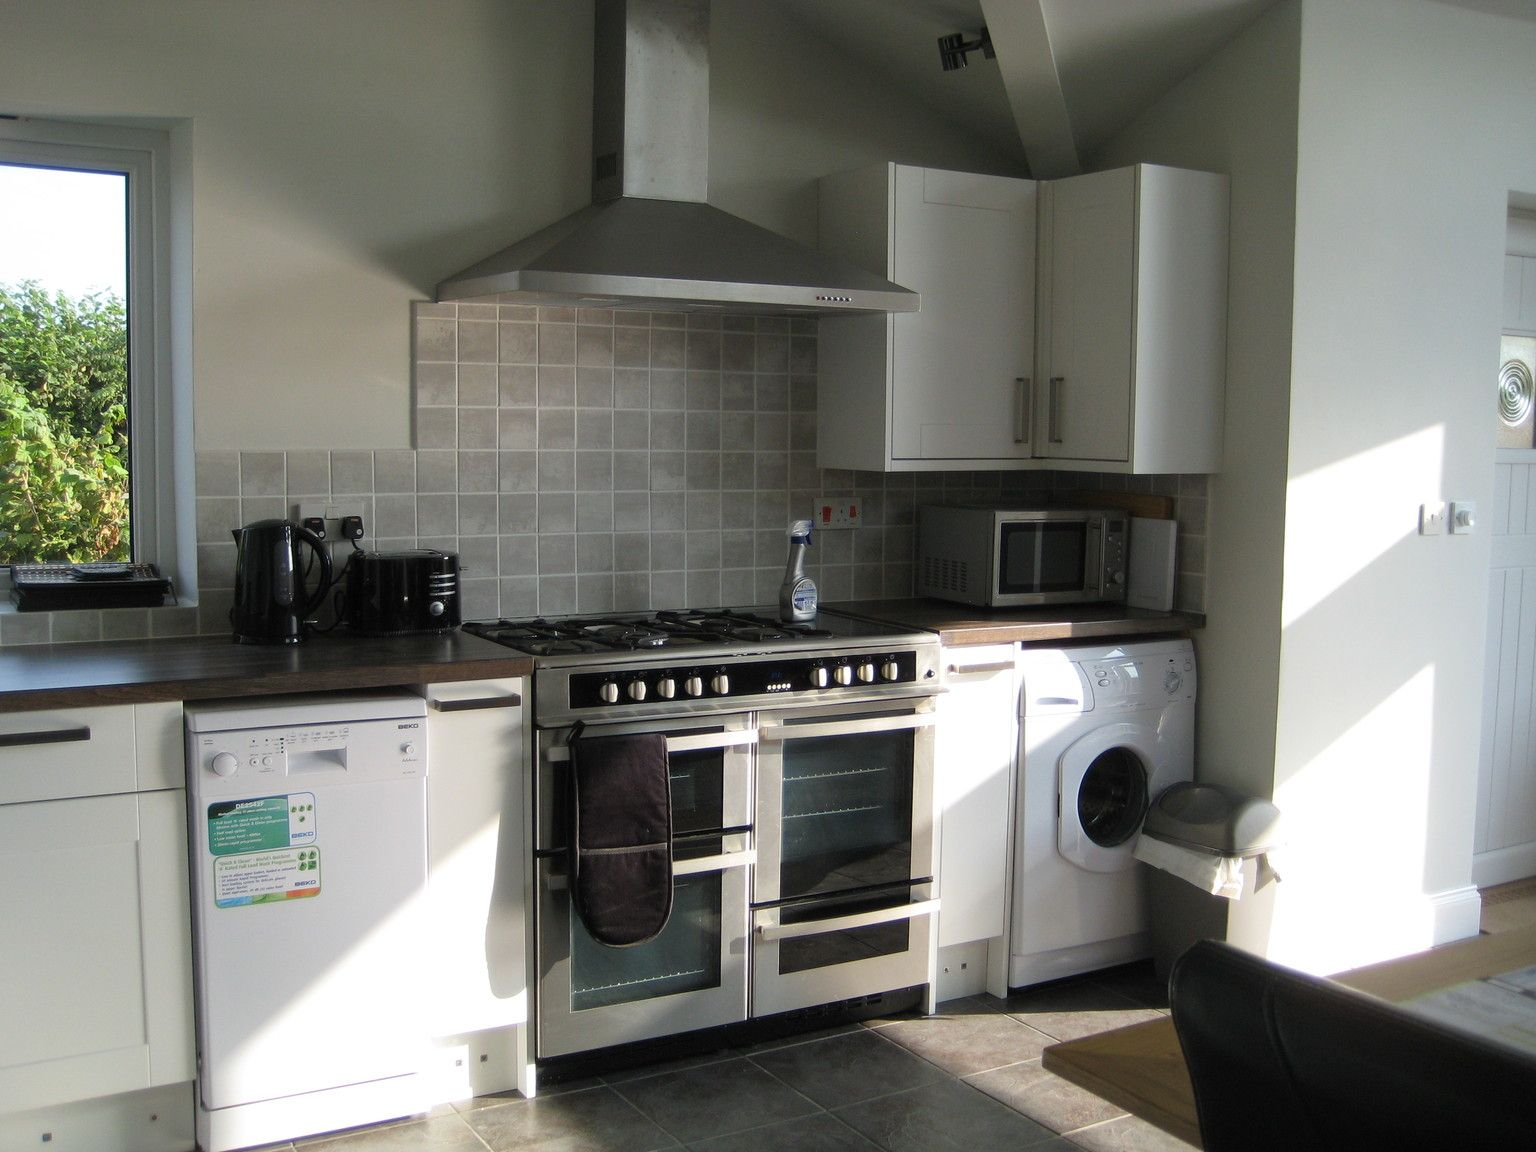 Minimalist Garage Converted Into A Kitchen Ideas: Wall Mounted Range Hood Backsplash Edge